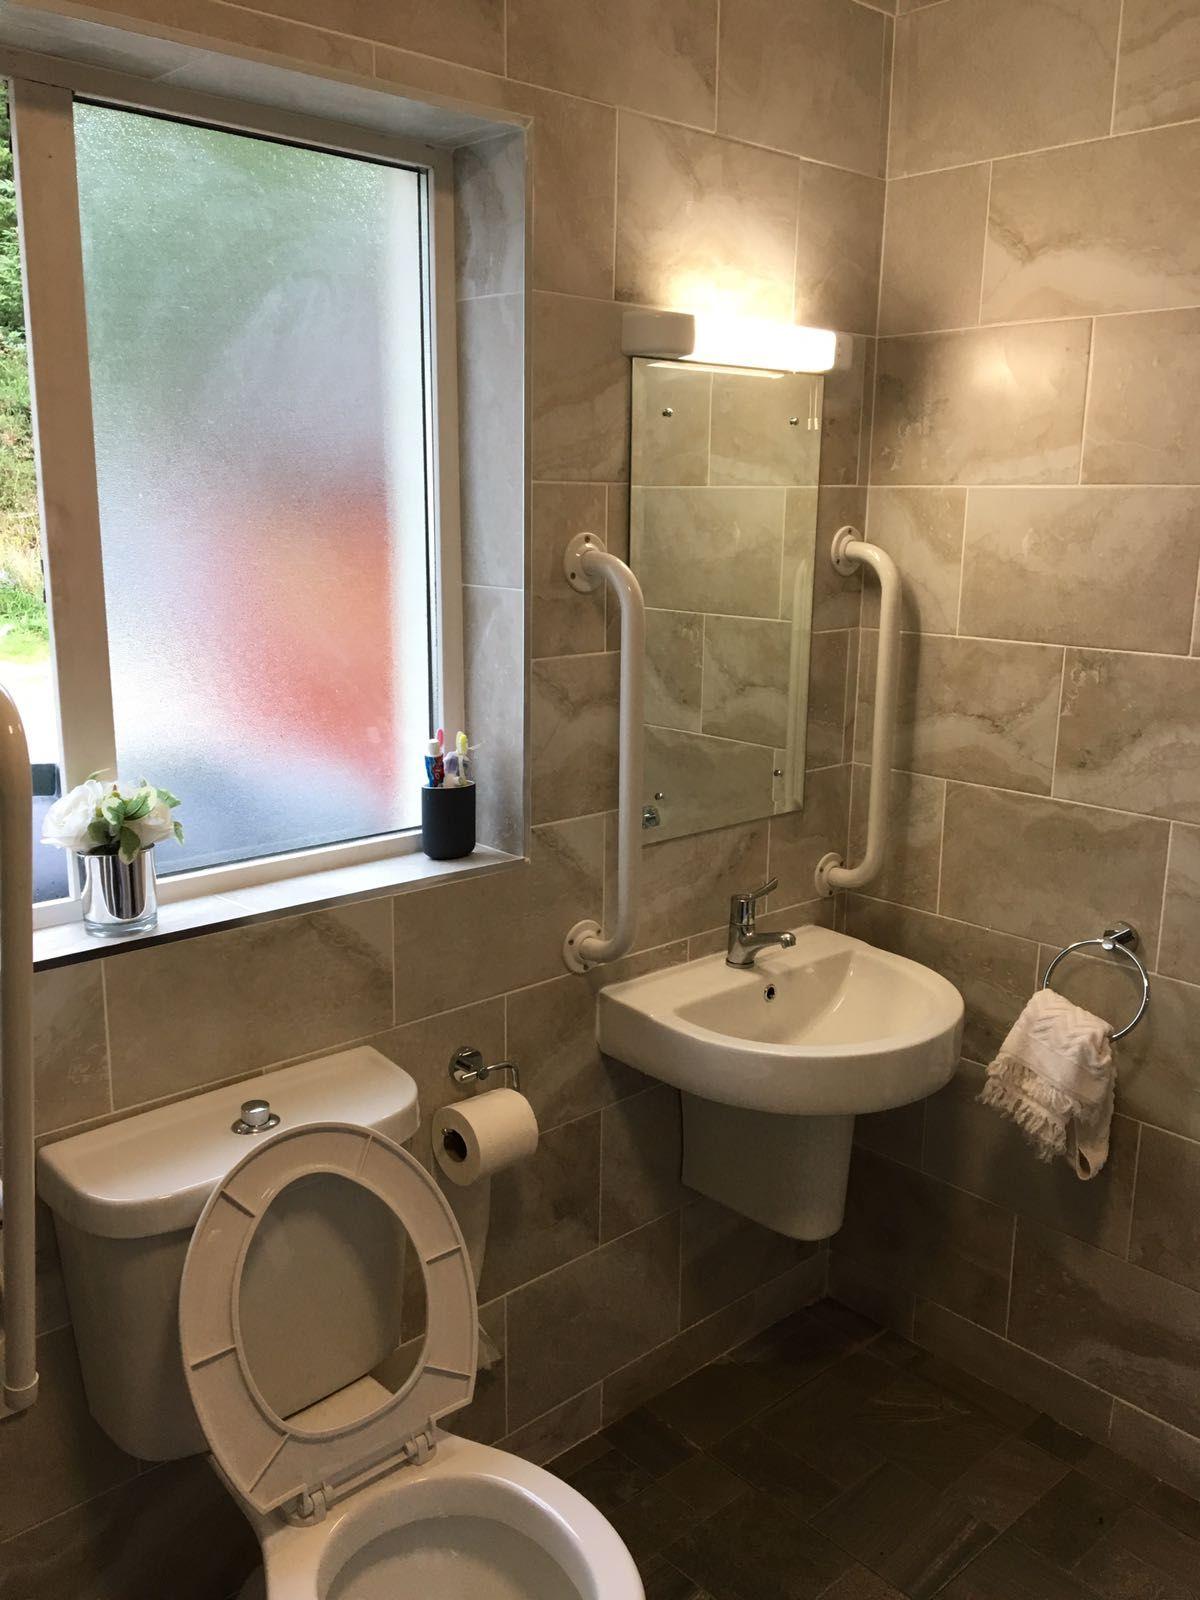 Pin by Bathrooms4U on b4u Mobility | Bathroom renovations ...